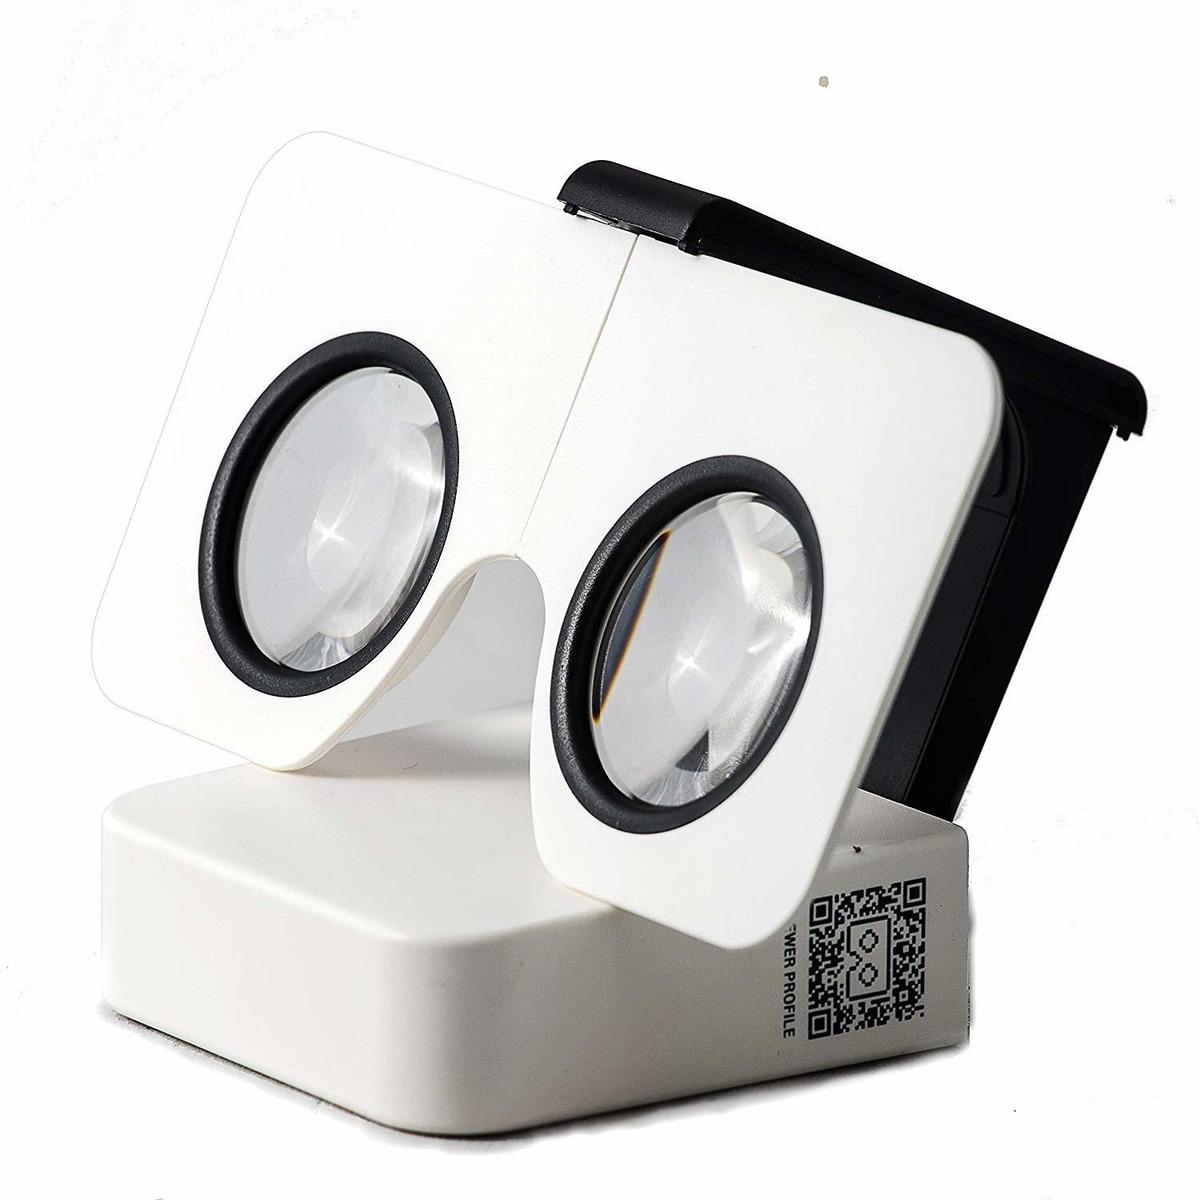 Pocket 360 Mini Vr Viewer | The Best Google Cardboard Virtua